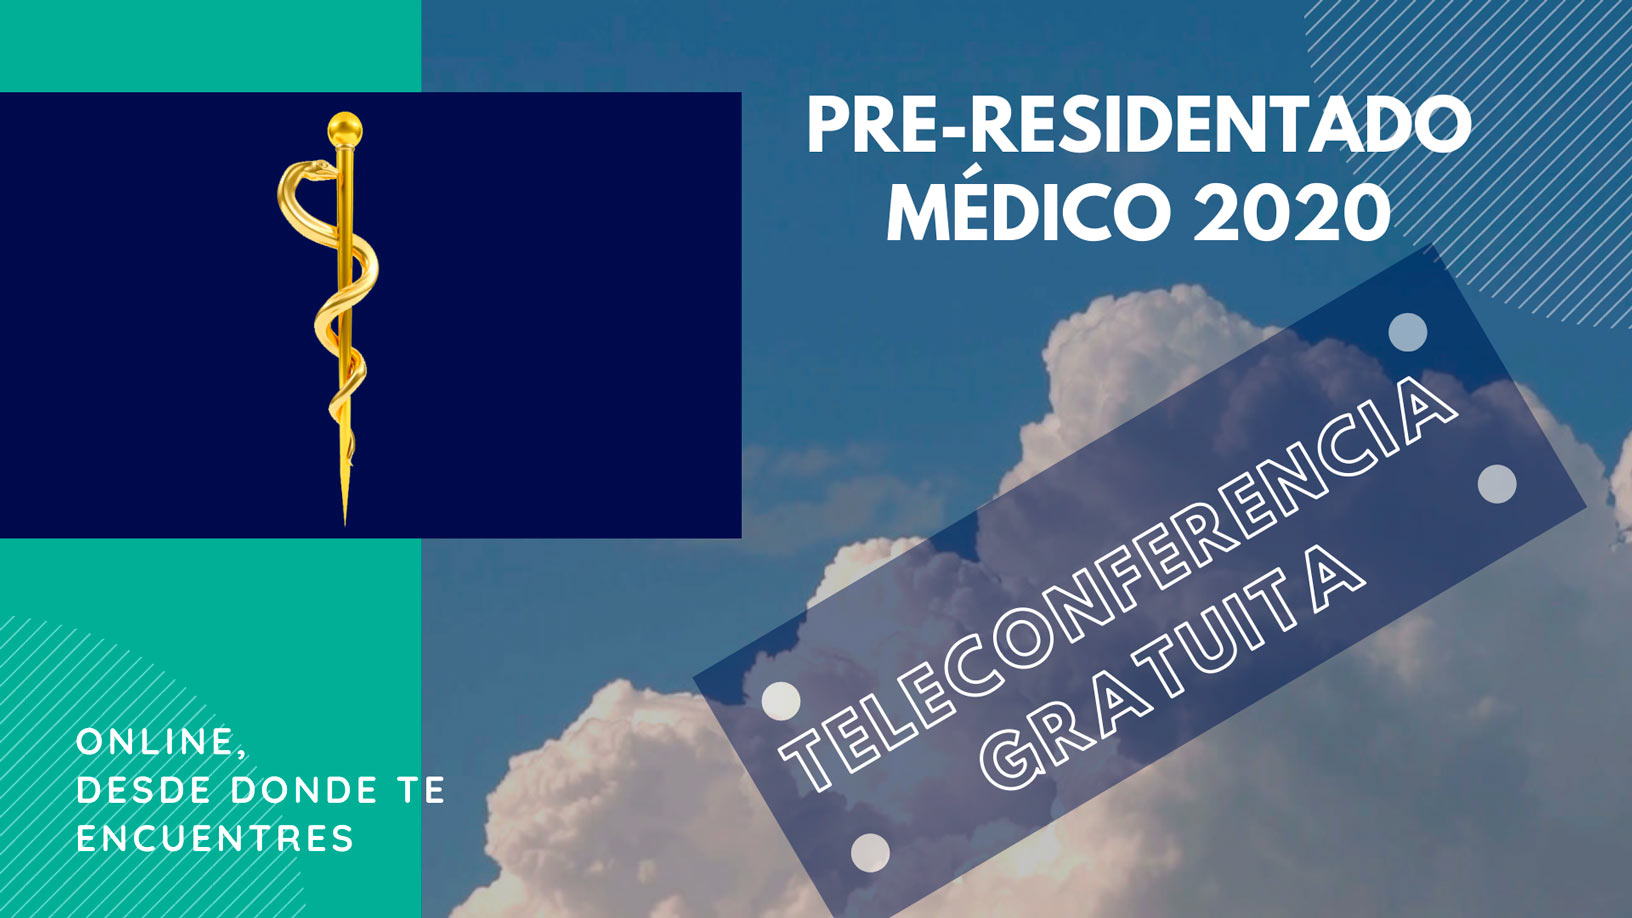 Teleconferencia Gratuita – Pre Residentado Médico 2020